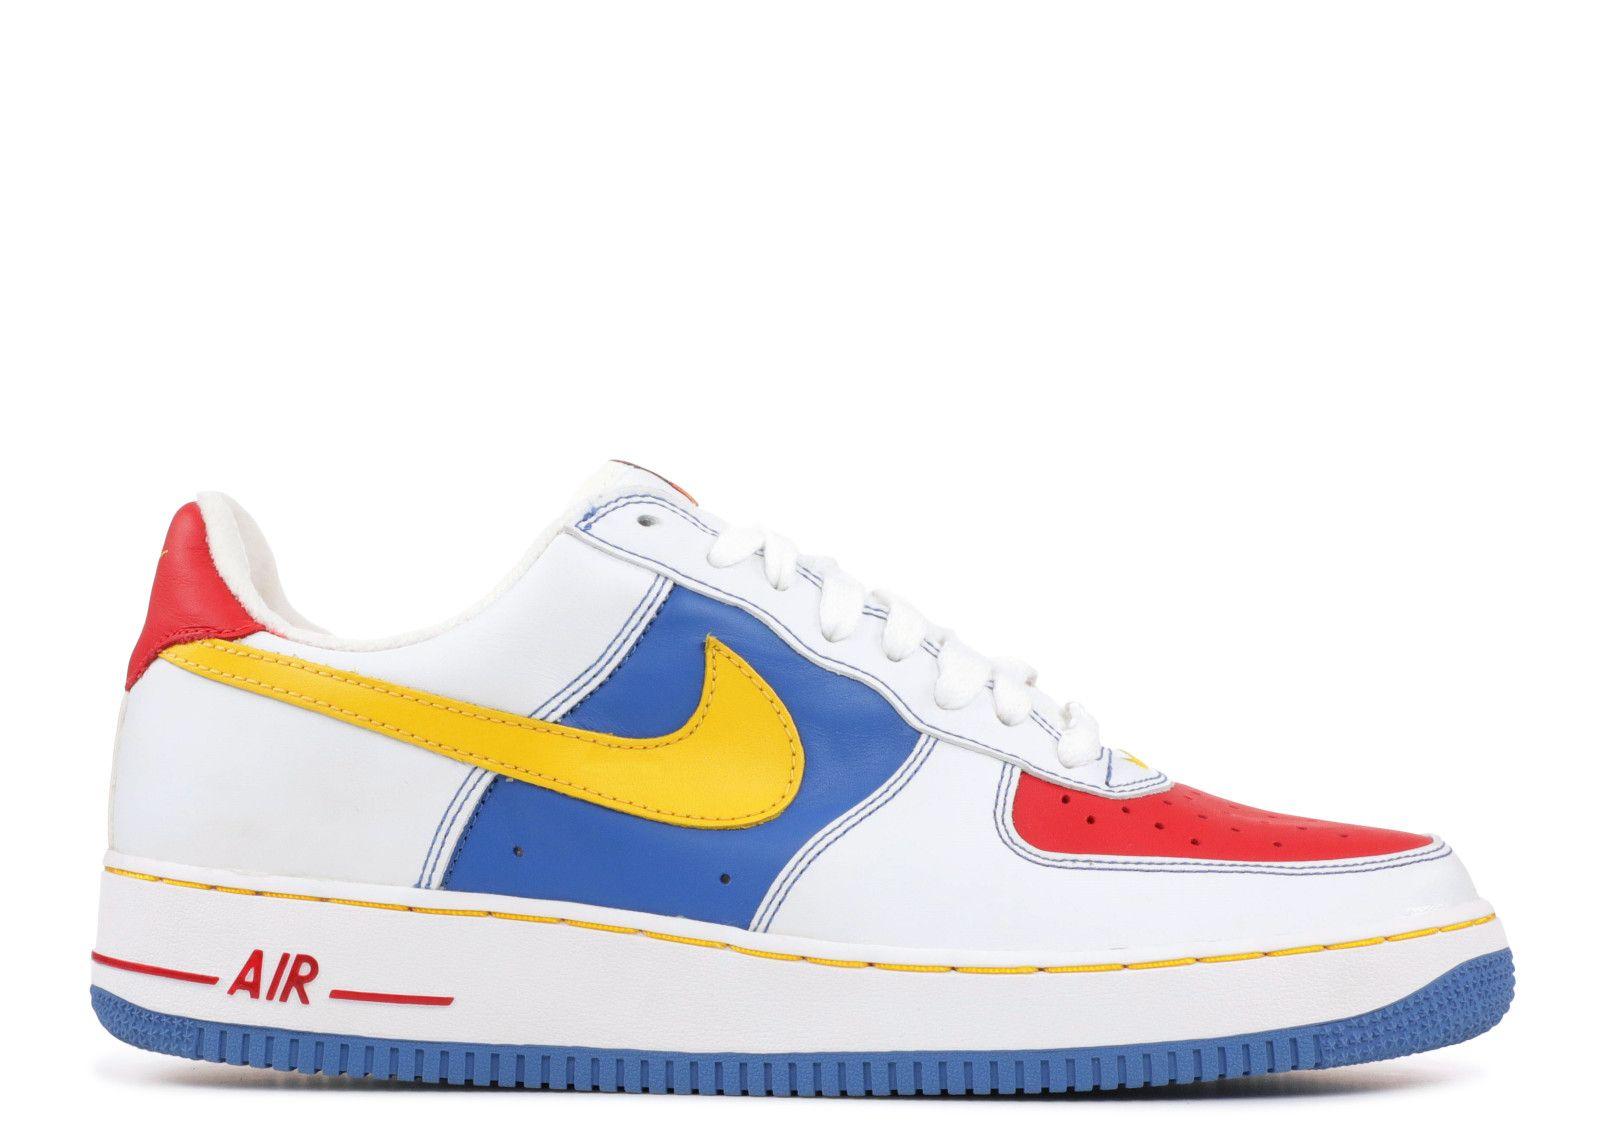 Original Nike Air Force One Low Men's Blue Beige Sale Online